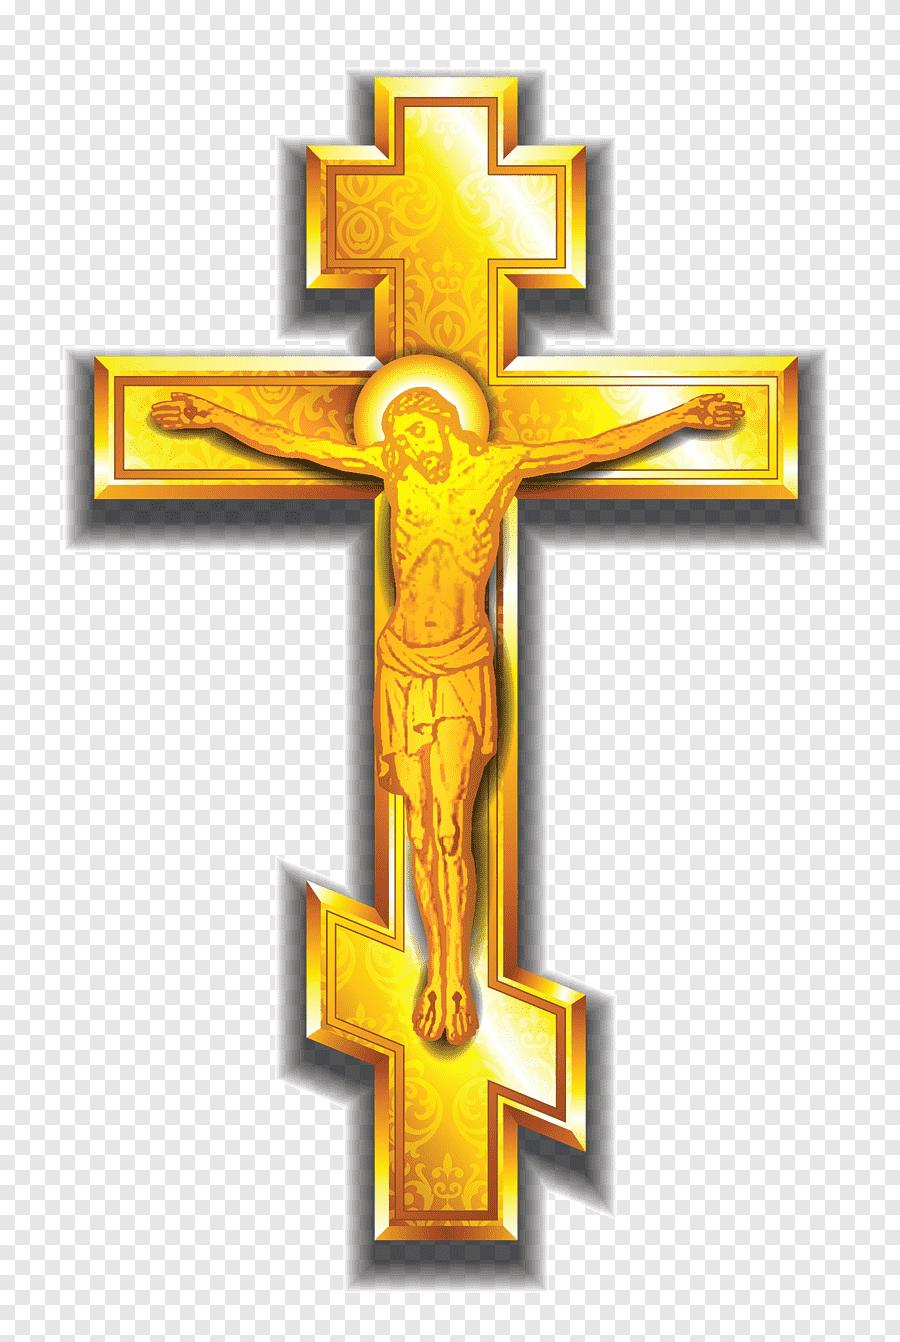 74 Gambar Salib Paling Keren - Gambar Pixabay